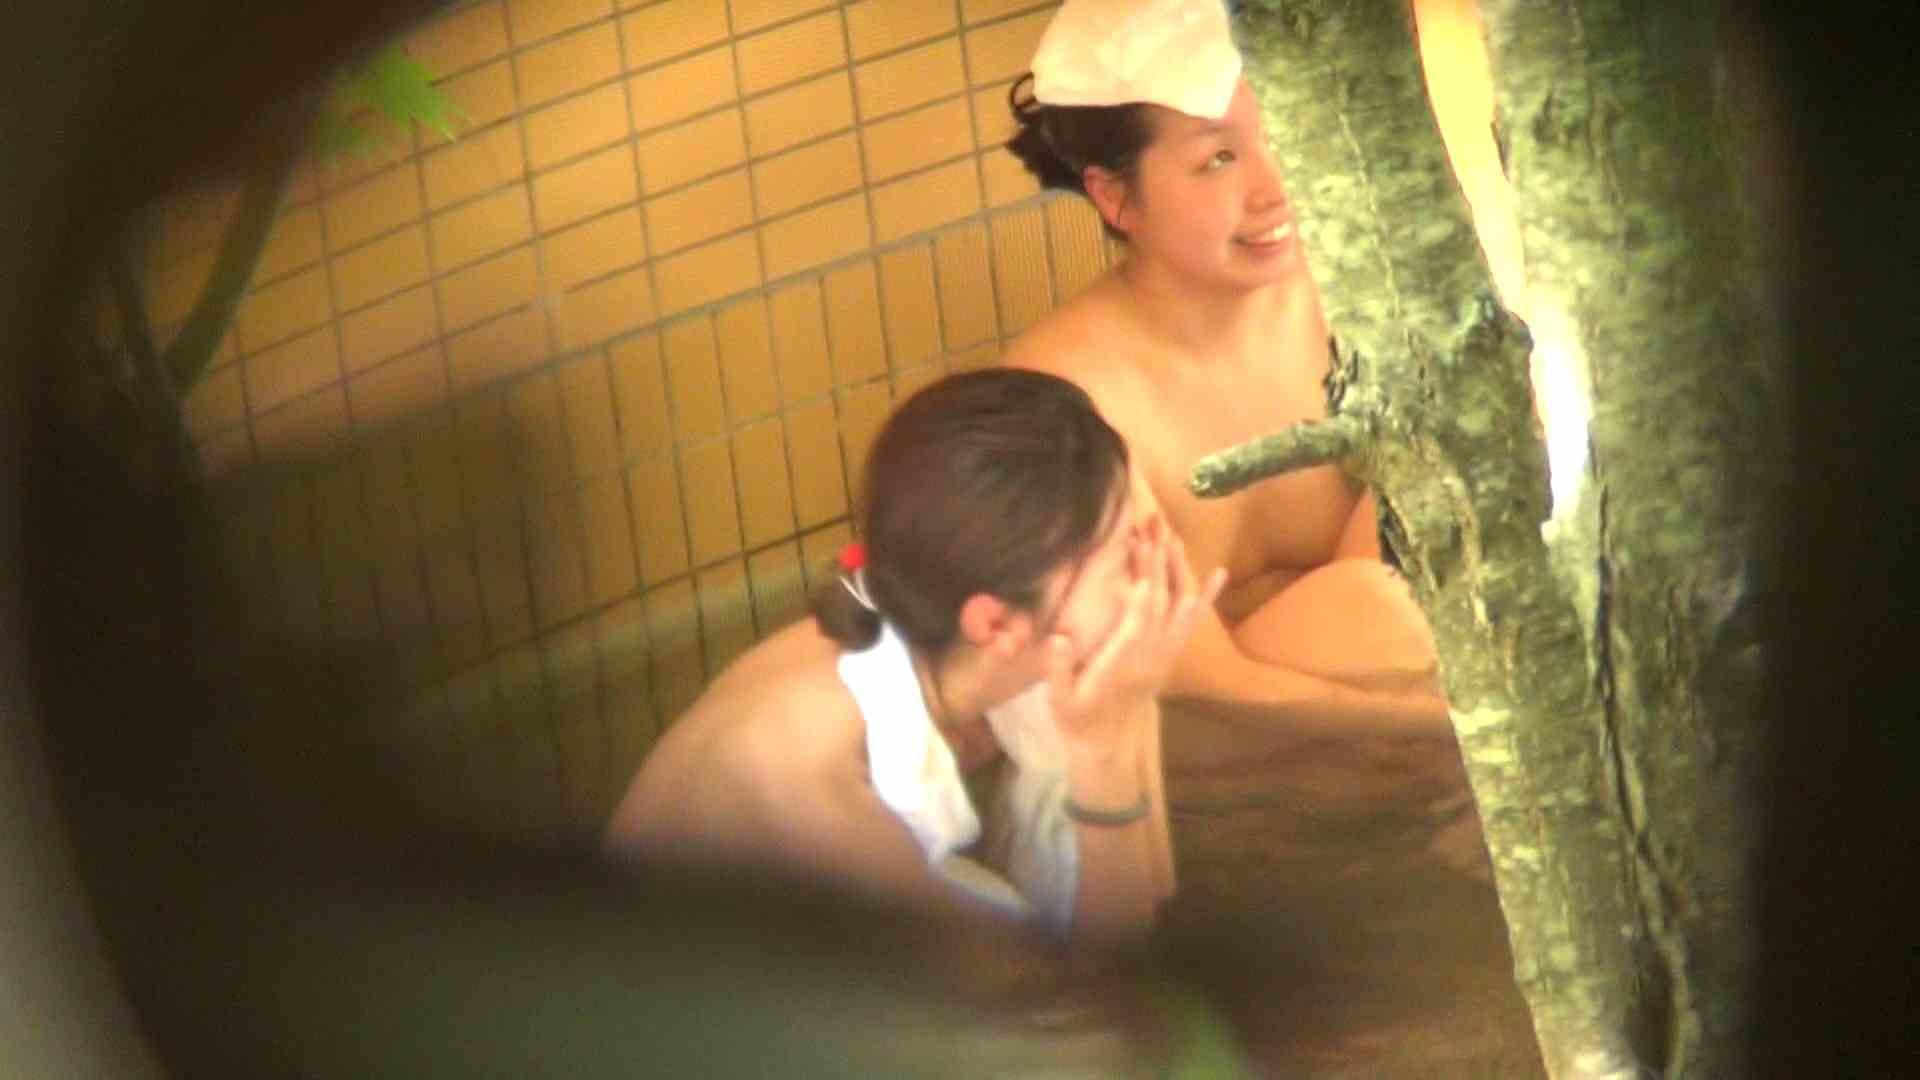 Vol.77 お上品な貧乳色白お女市さまの裸を見る醍醐味 美女 覗きオメコ動画キャプチャ 76pic 30